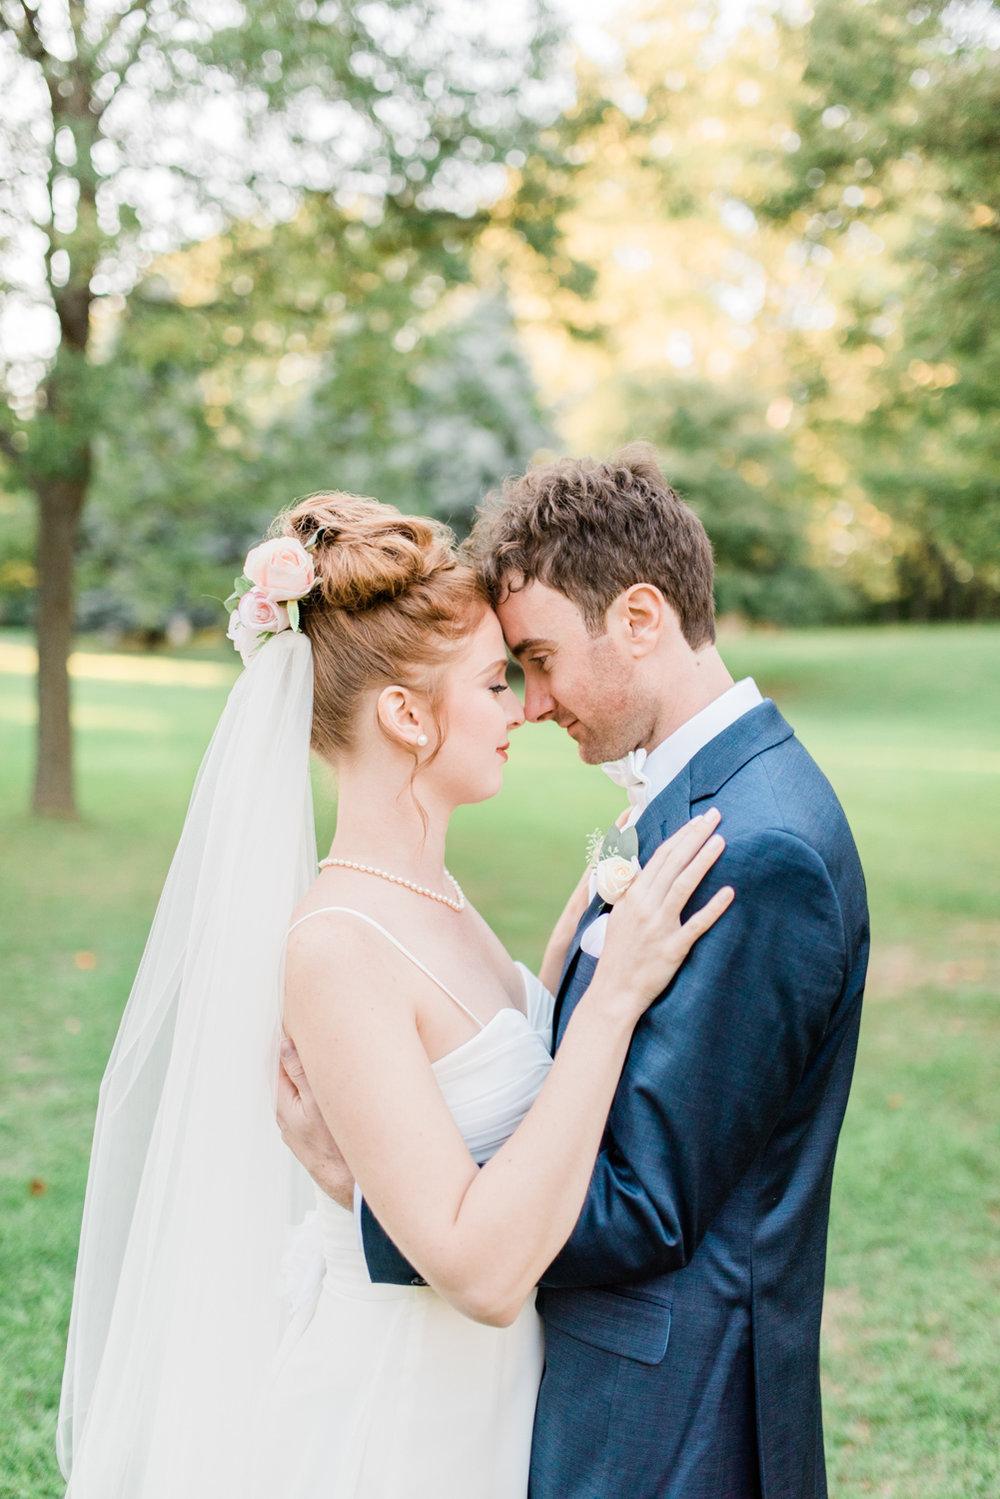 Hamilton Destination Wedding Photographer -83.jpg